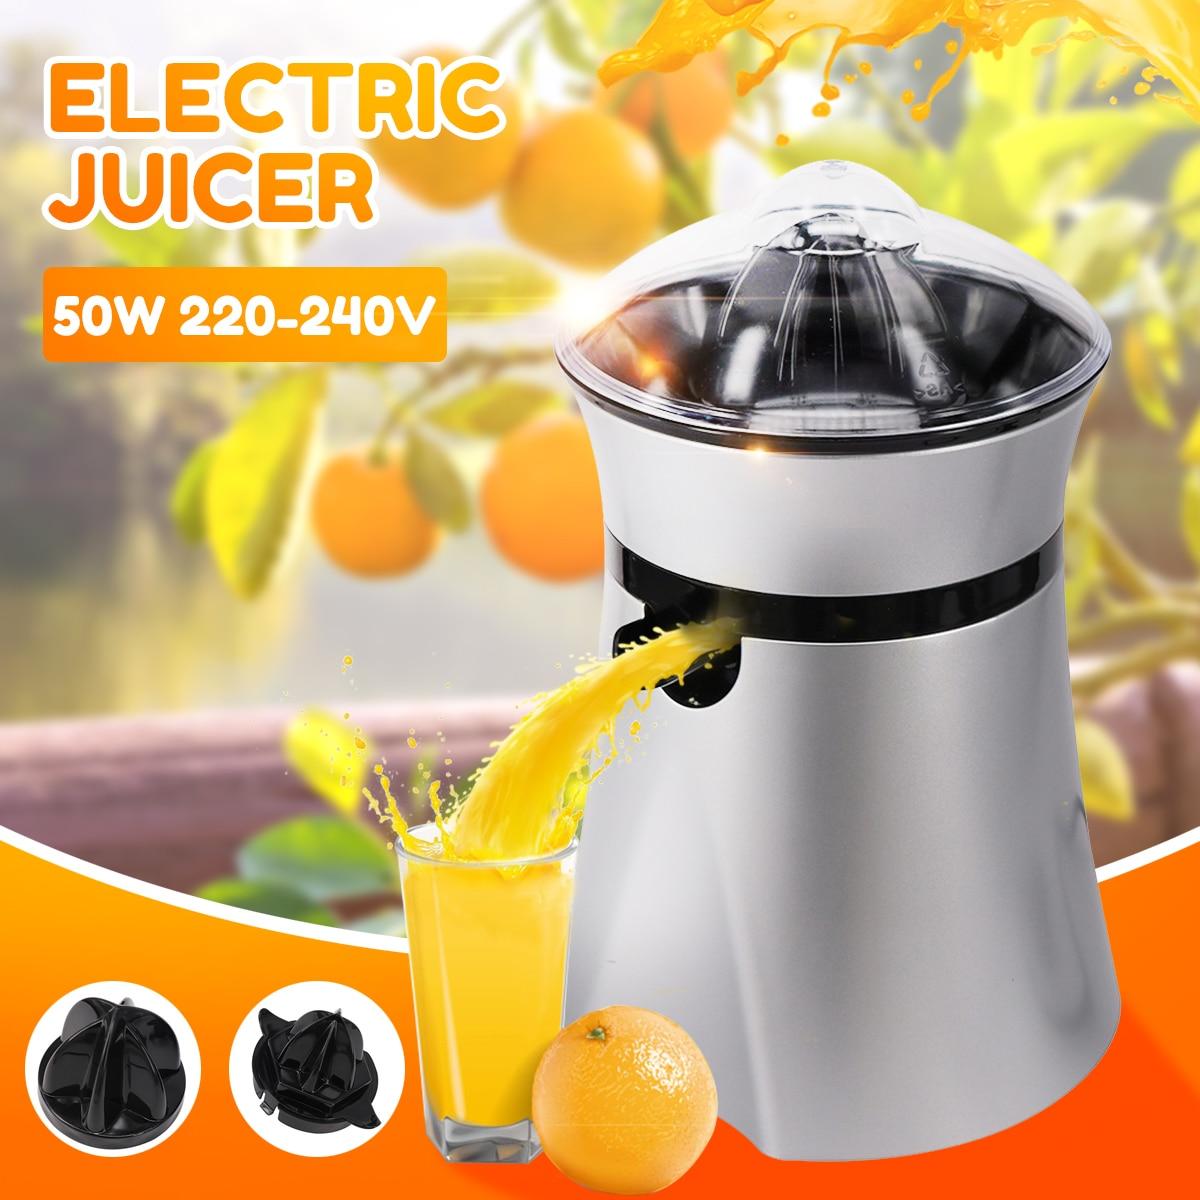 220-240V Electric Juicer Stainless Steel Citrus Orange Fruit Lemon Squeezer Juice Extractor Juice Presser Fruit Drinking Machine